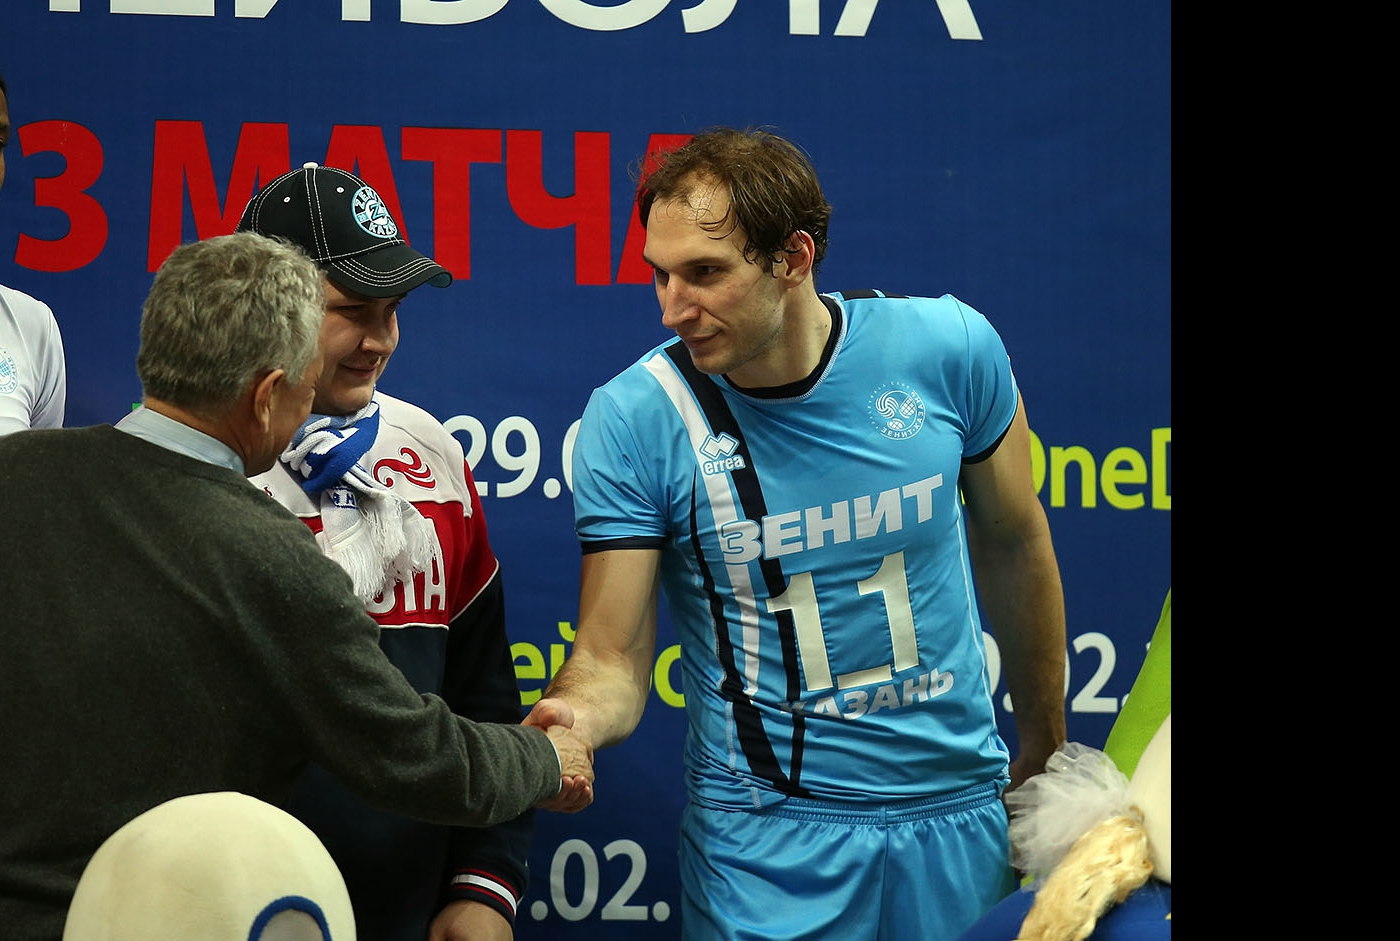 Андрей Ащев